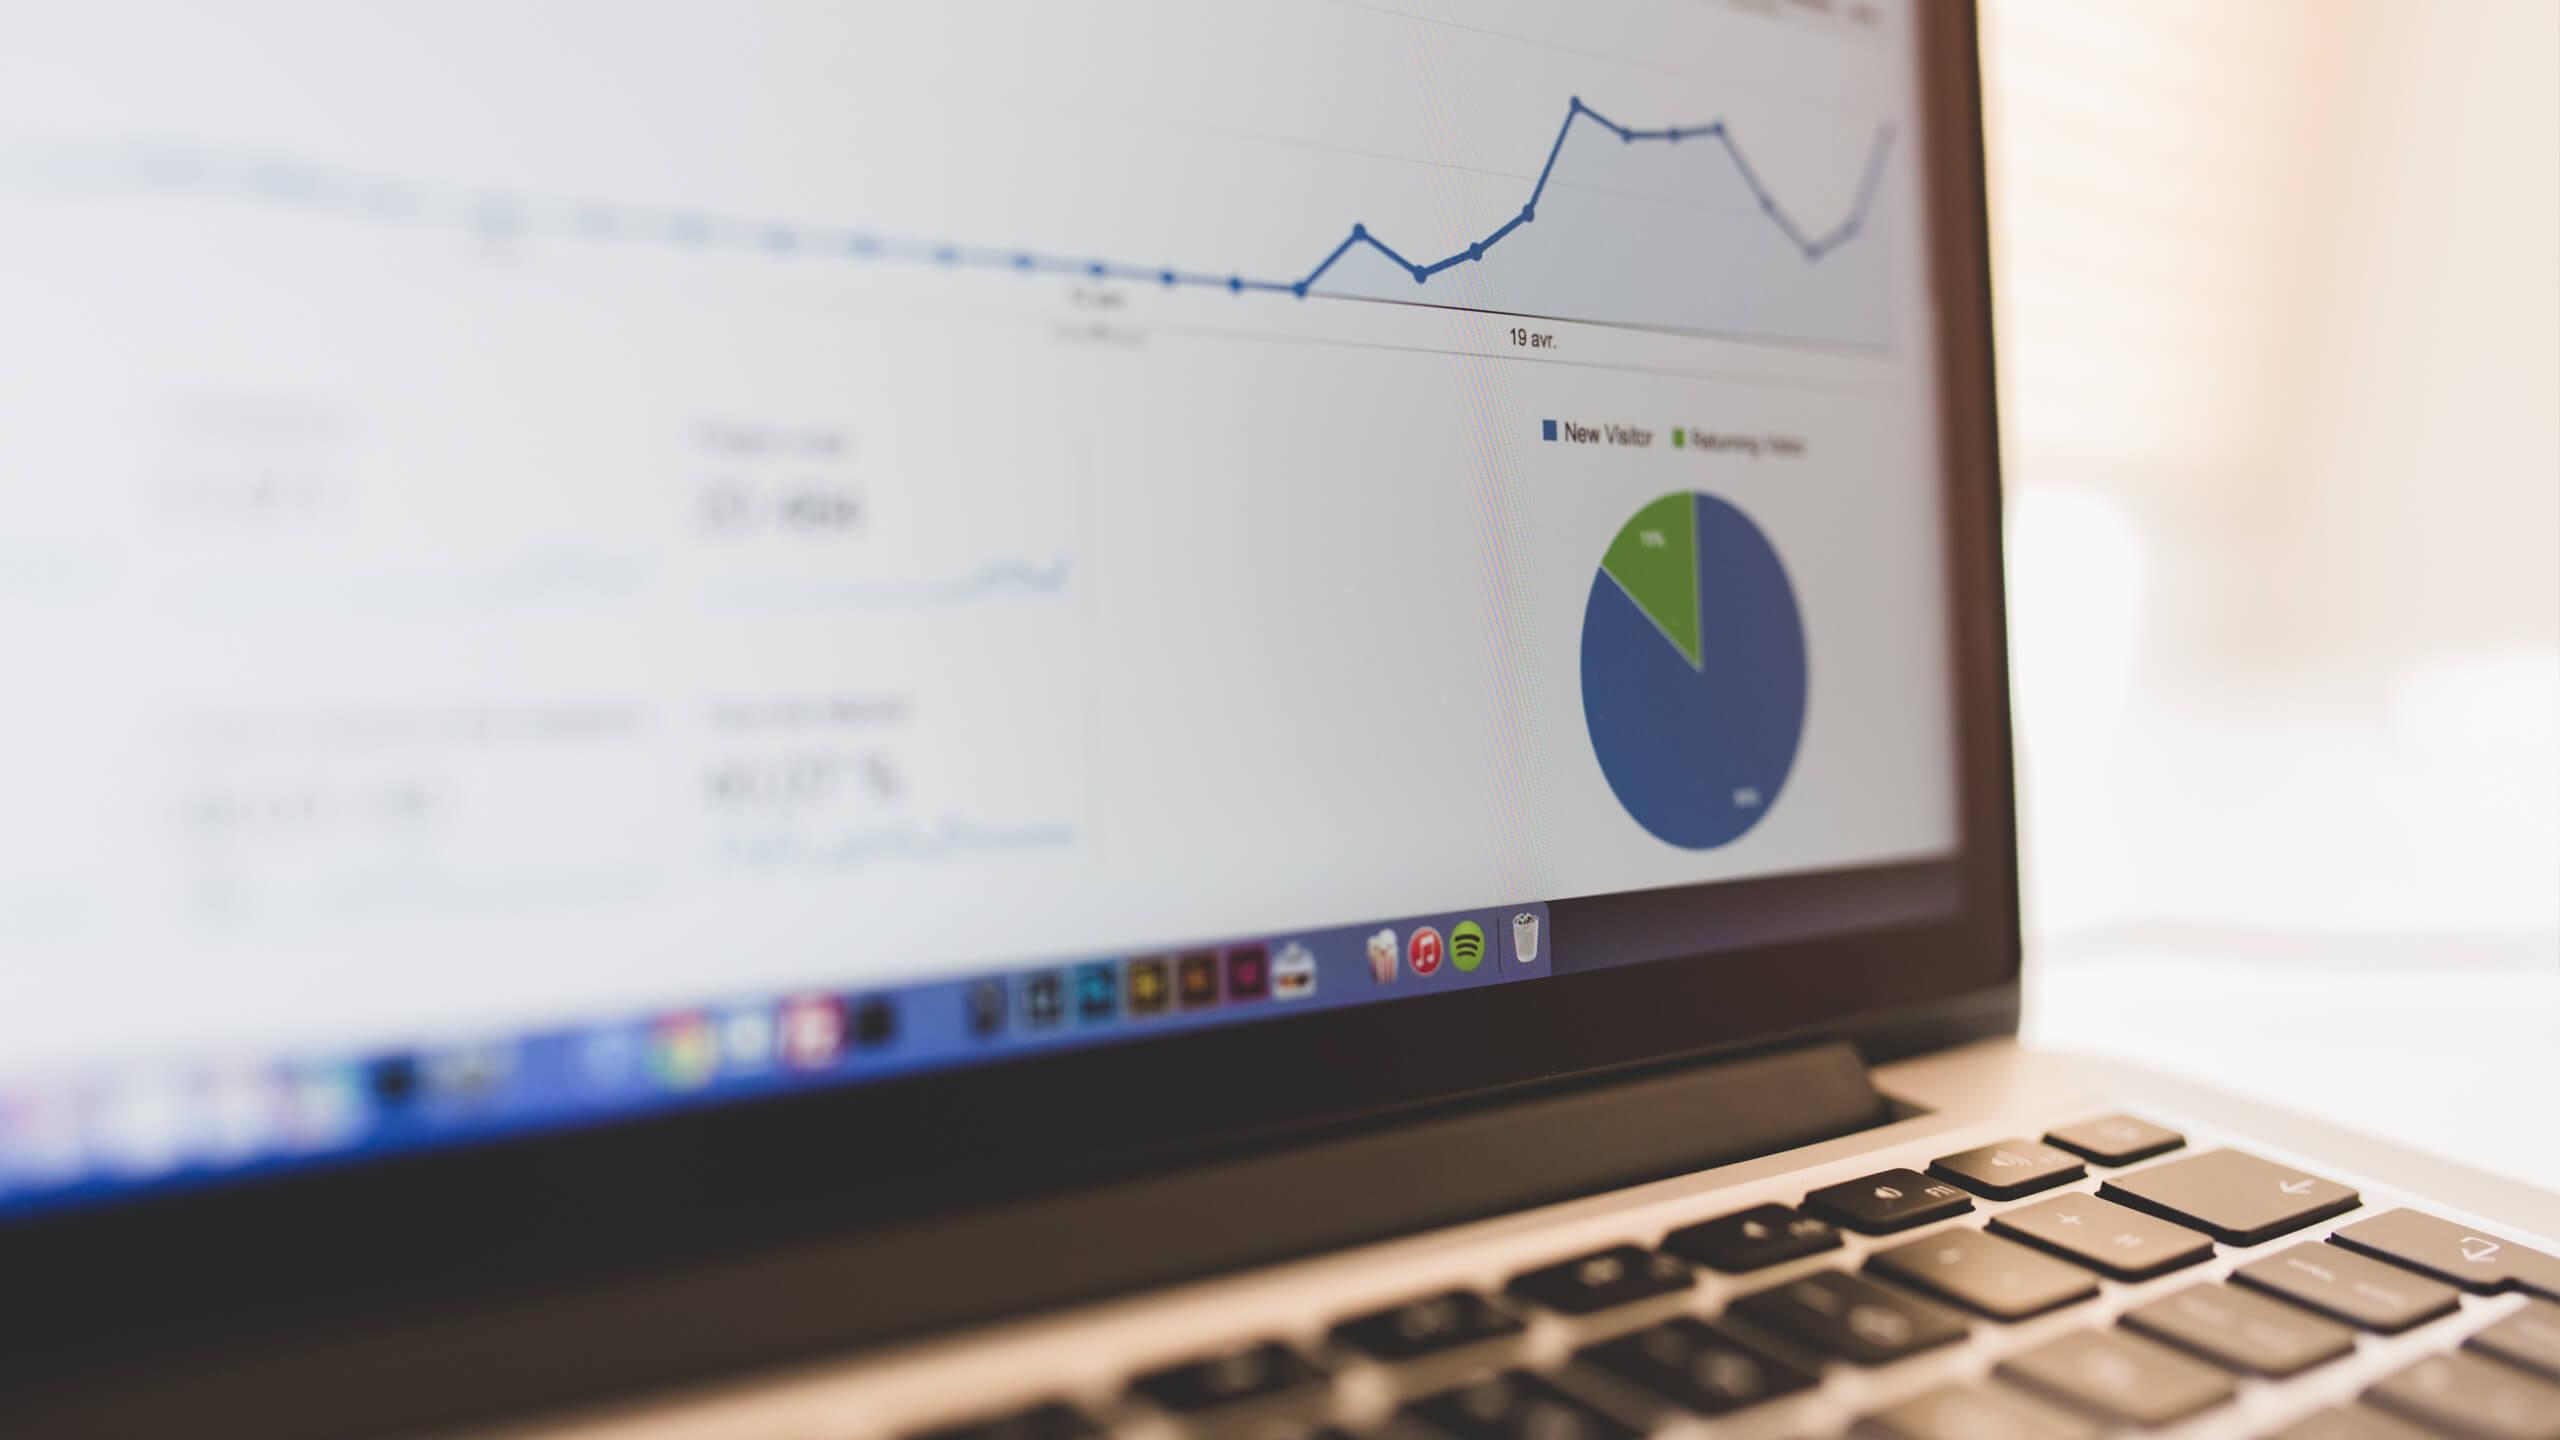 Measure your website traffic with Strategic Marketing, Inc. - Digital marketing agency based in Portland, Oregon